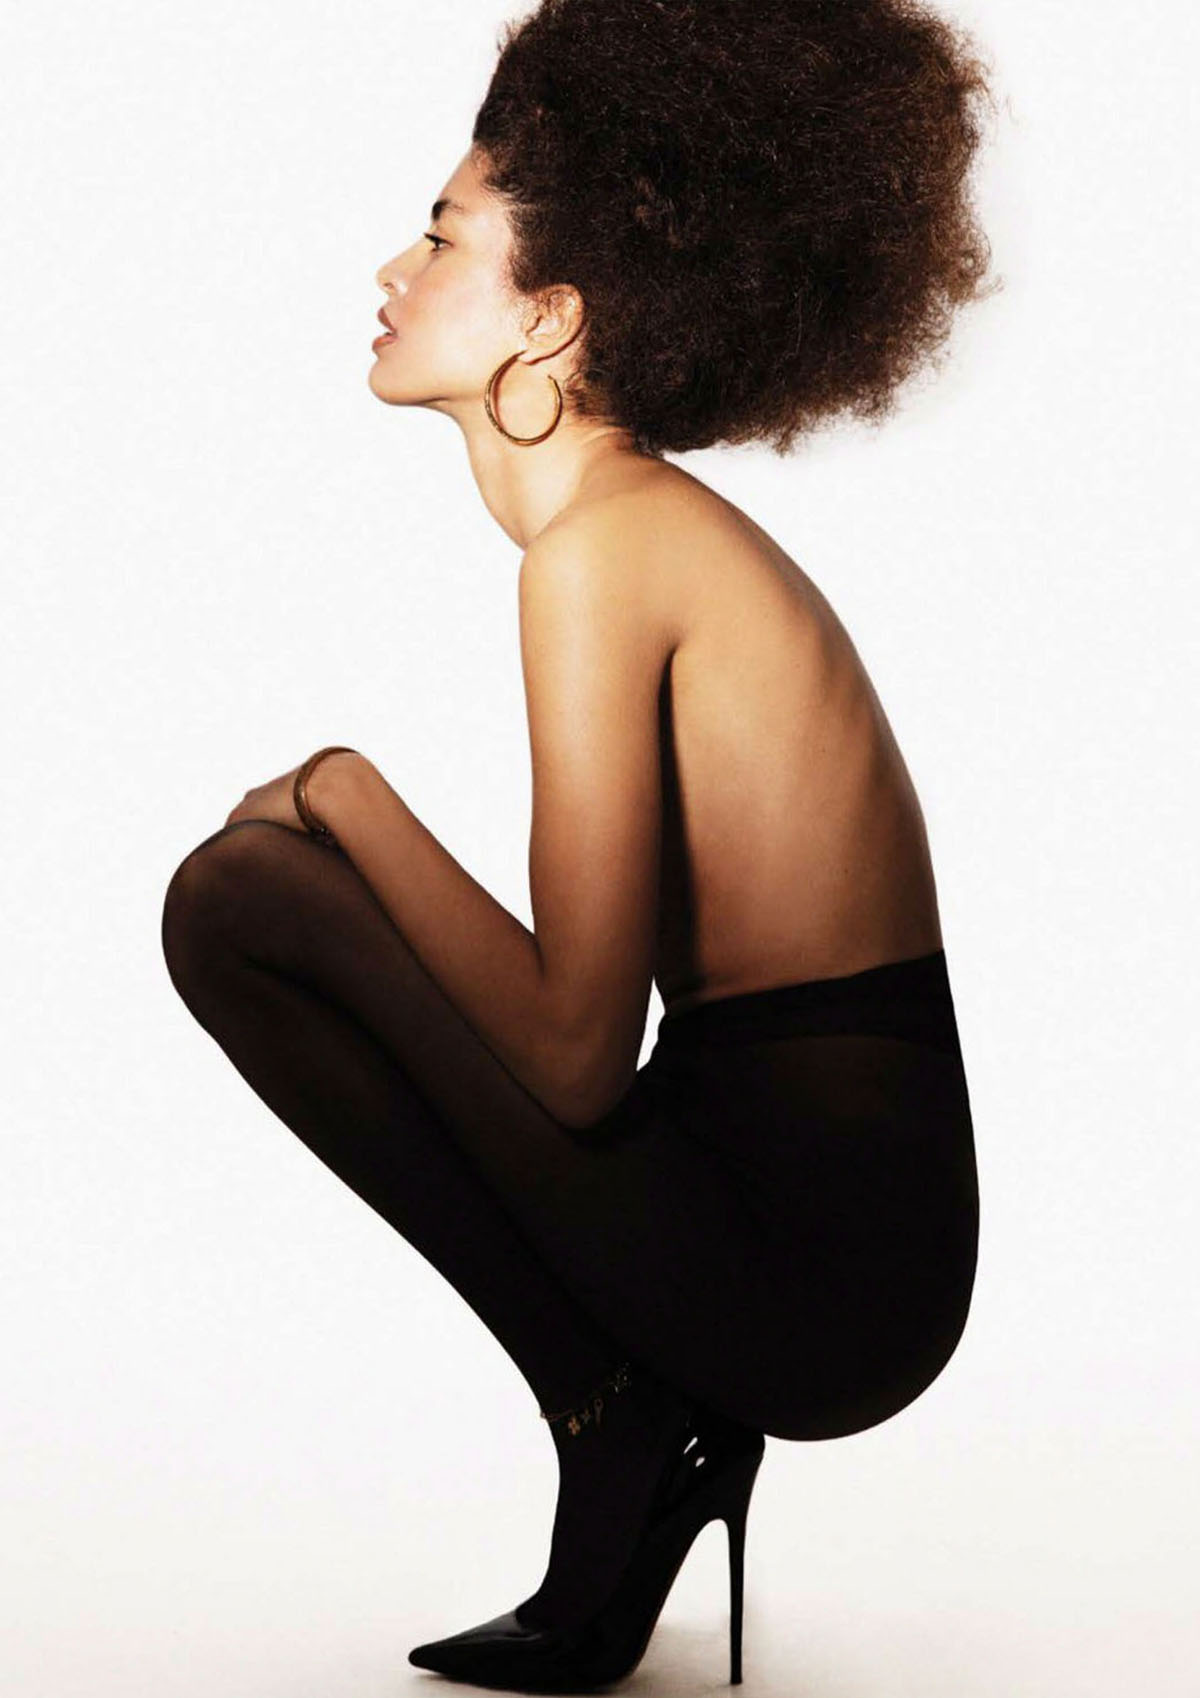 Luz Pavon by Daniella Midenge for Vogue Mexico & Latin America August 2021